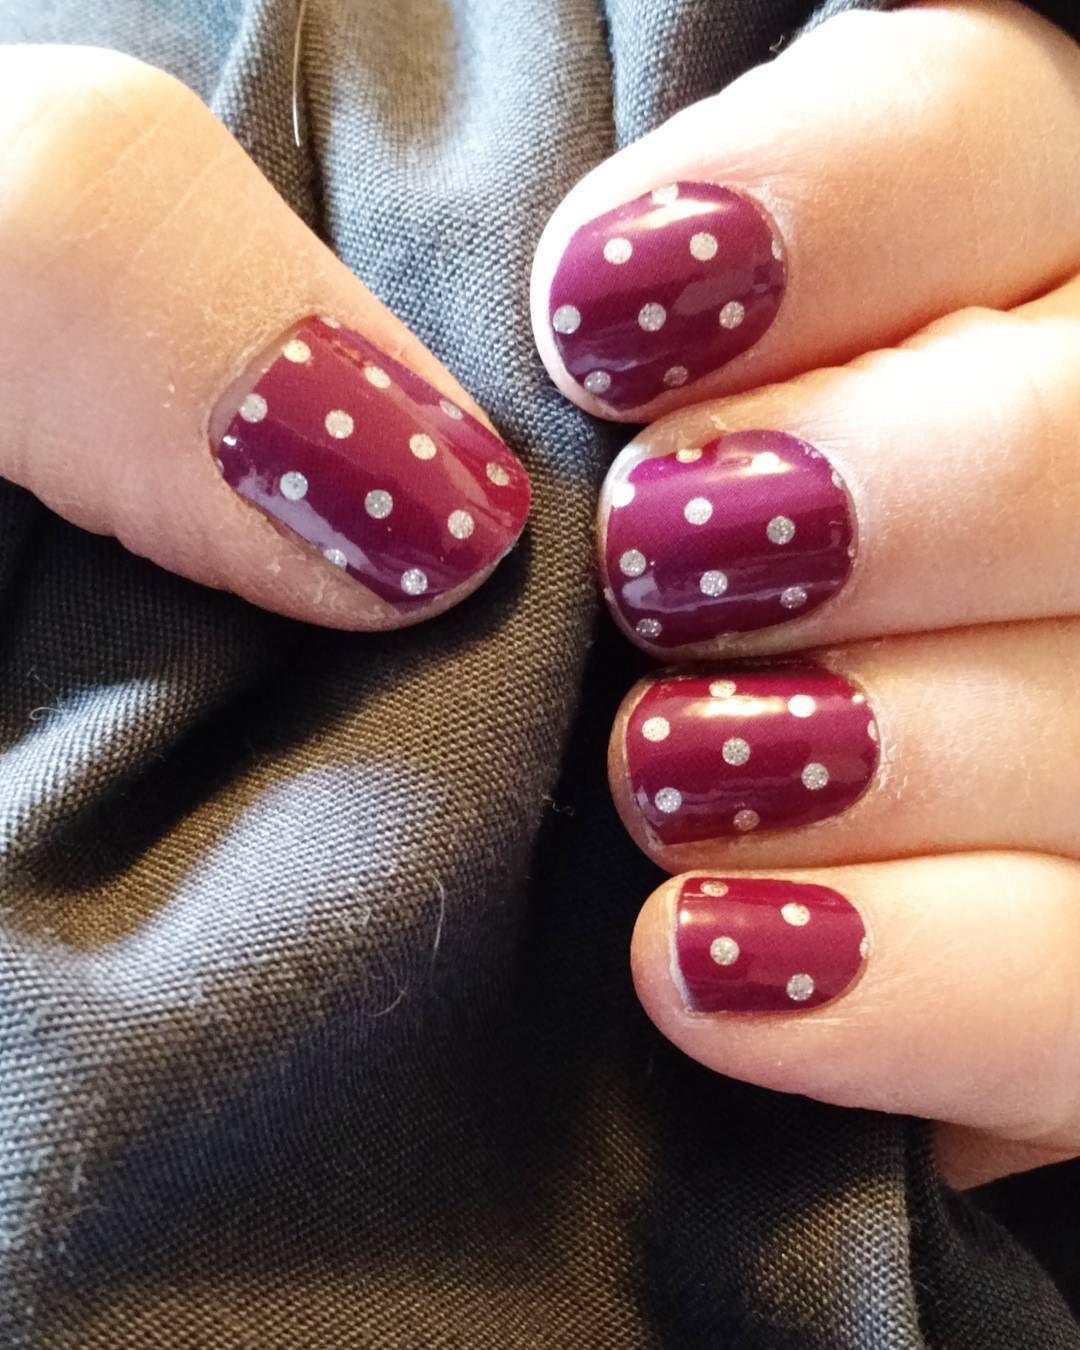 "Jamberry - Icy Boysenberry Polka Lorraine Hauger Instagram lorrainehauger  #jamberry #jamberrynails #jamberrynailwraps #IcyBoysenberryPolka #icyboysenberrypolkajn #fallnails"""